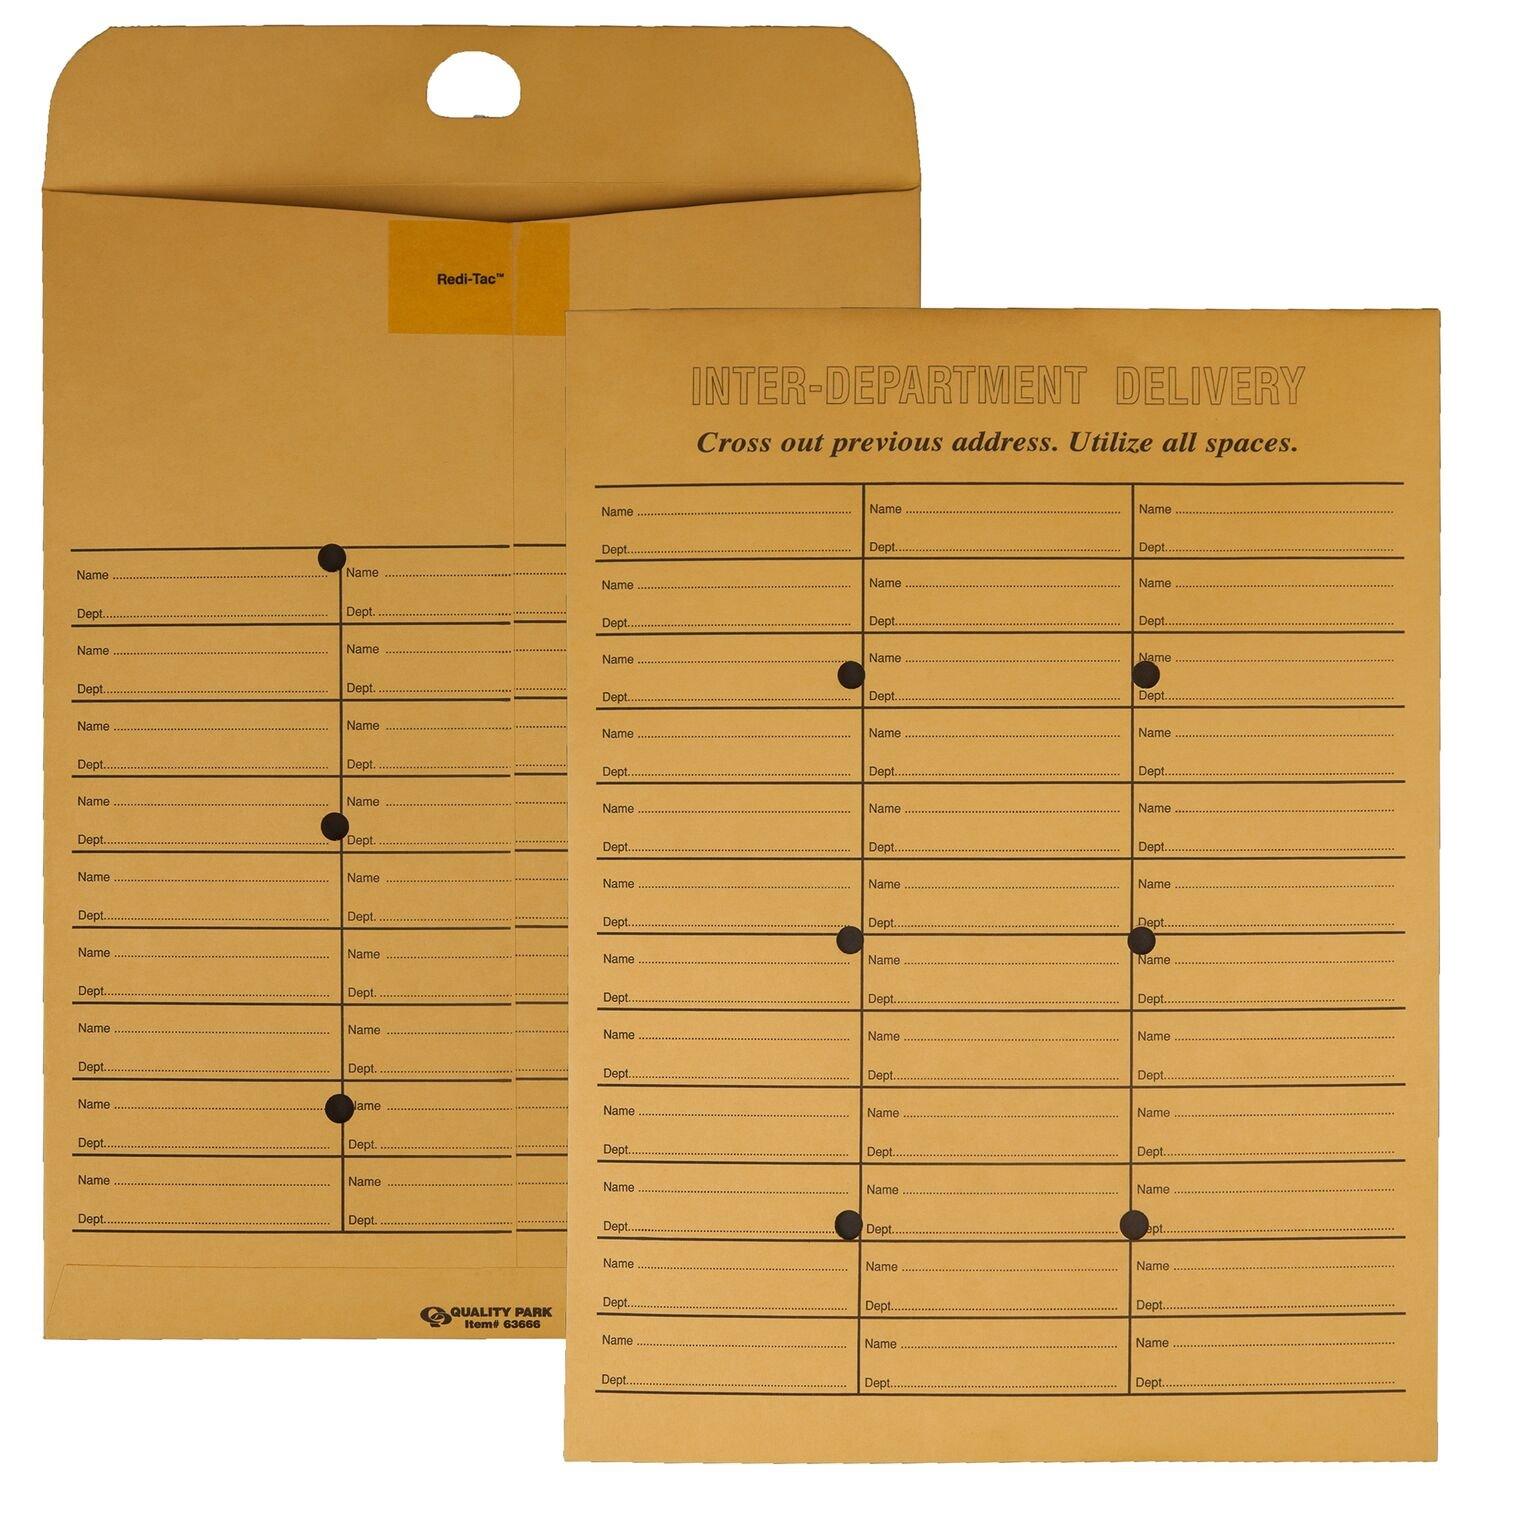 Quality Park 2-Side Interoffice Envelopes, Redi-Tac Box-Style, Brown Kraft, 10 x 13, 100 per Box, (63666) by Quality Park